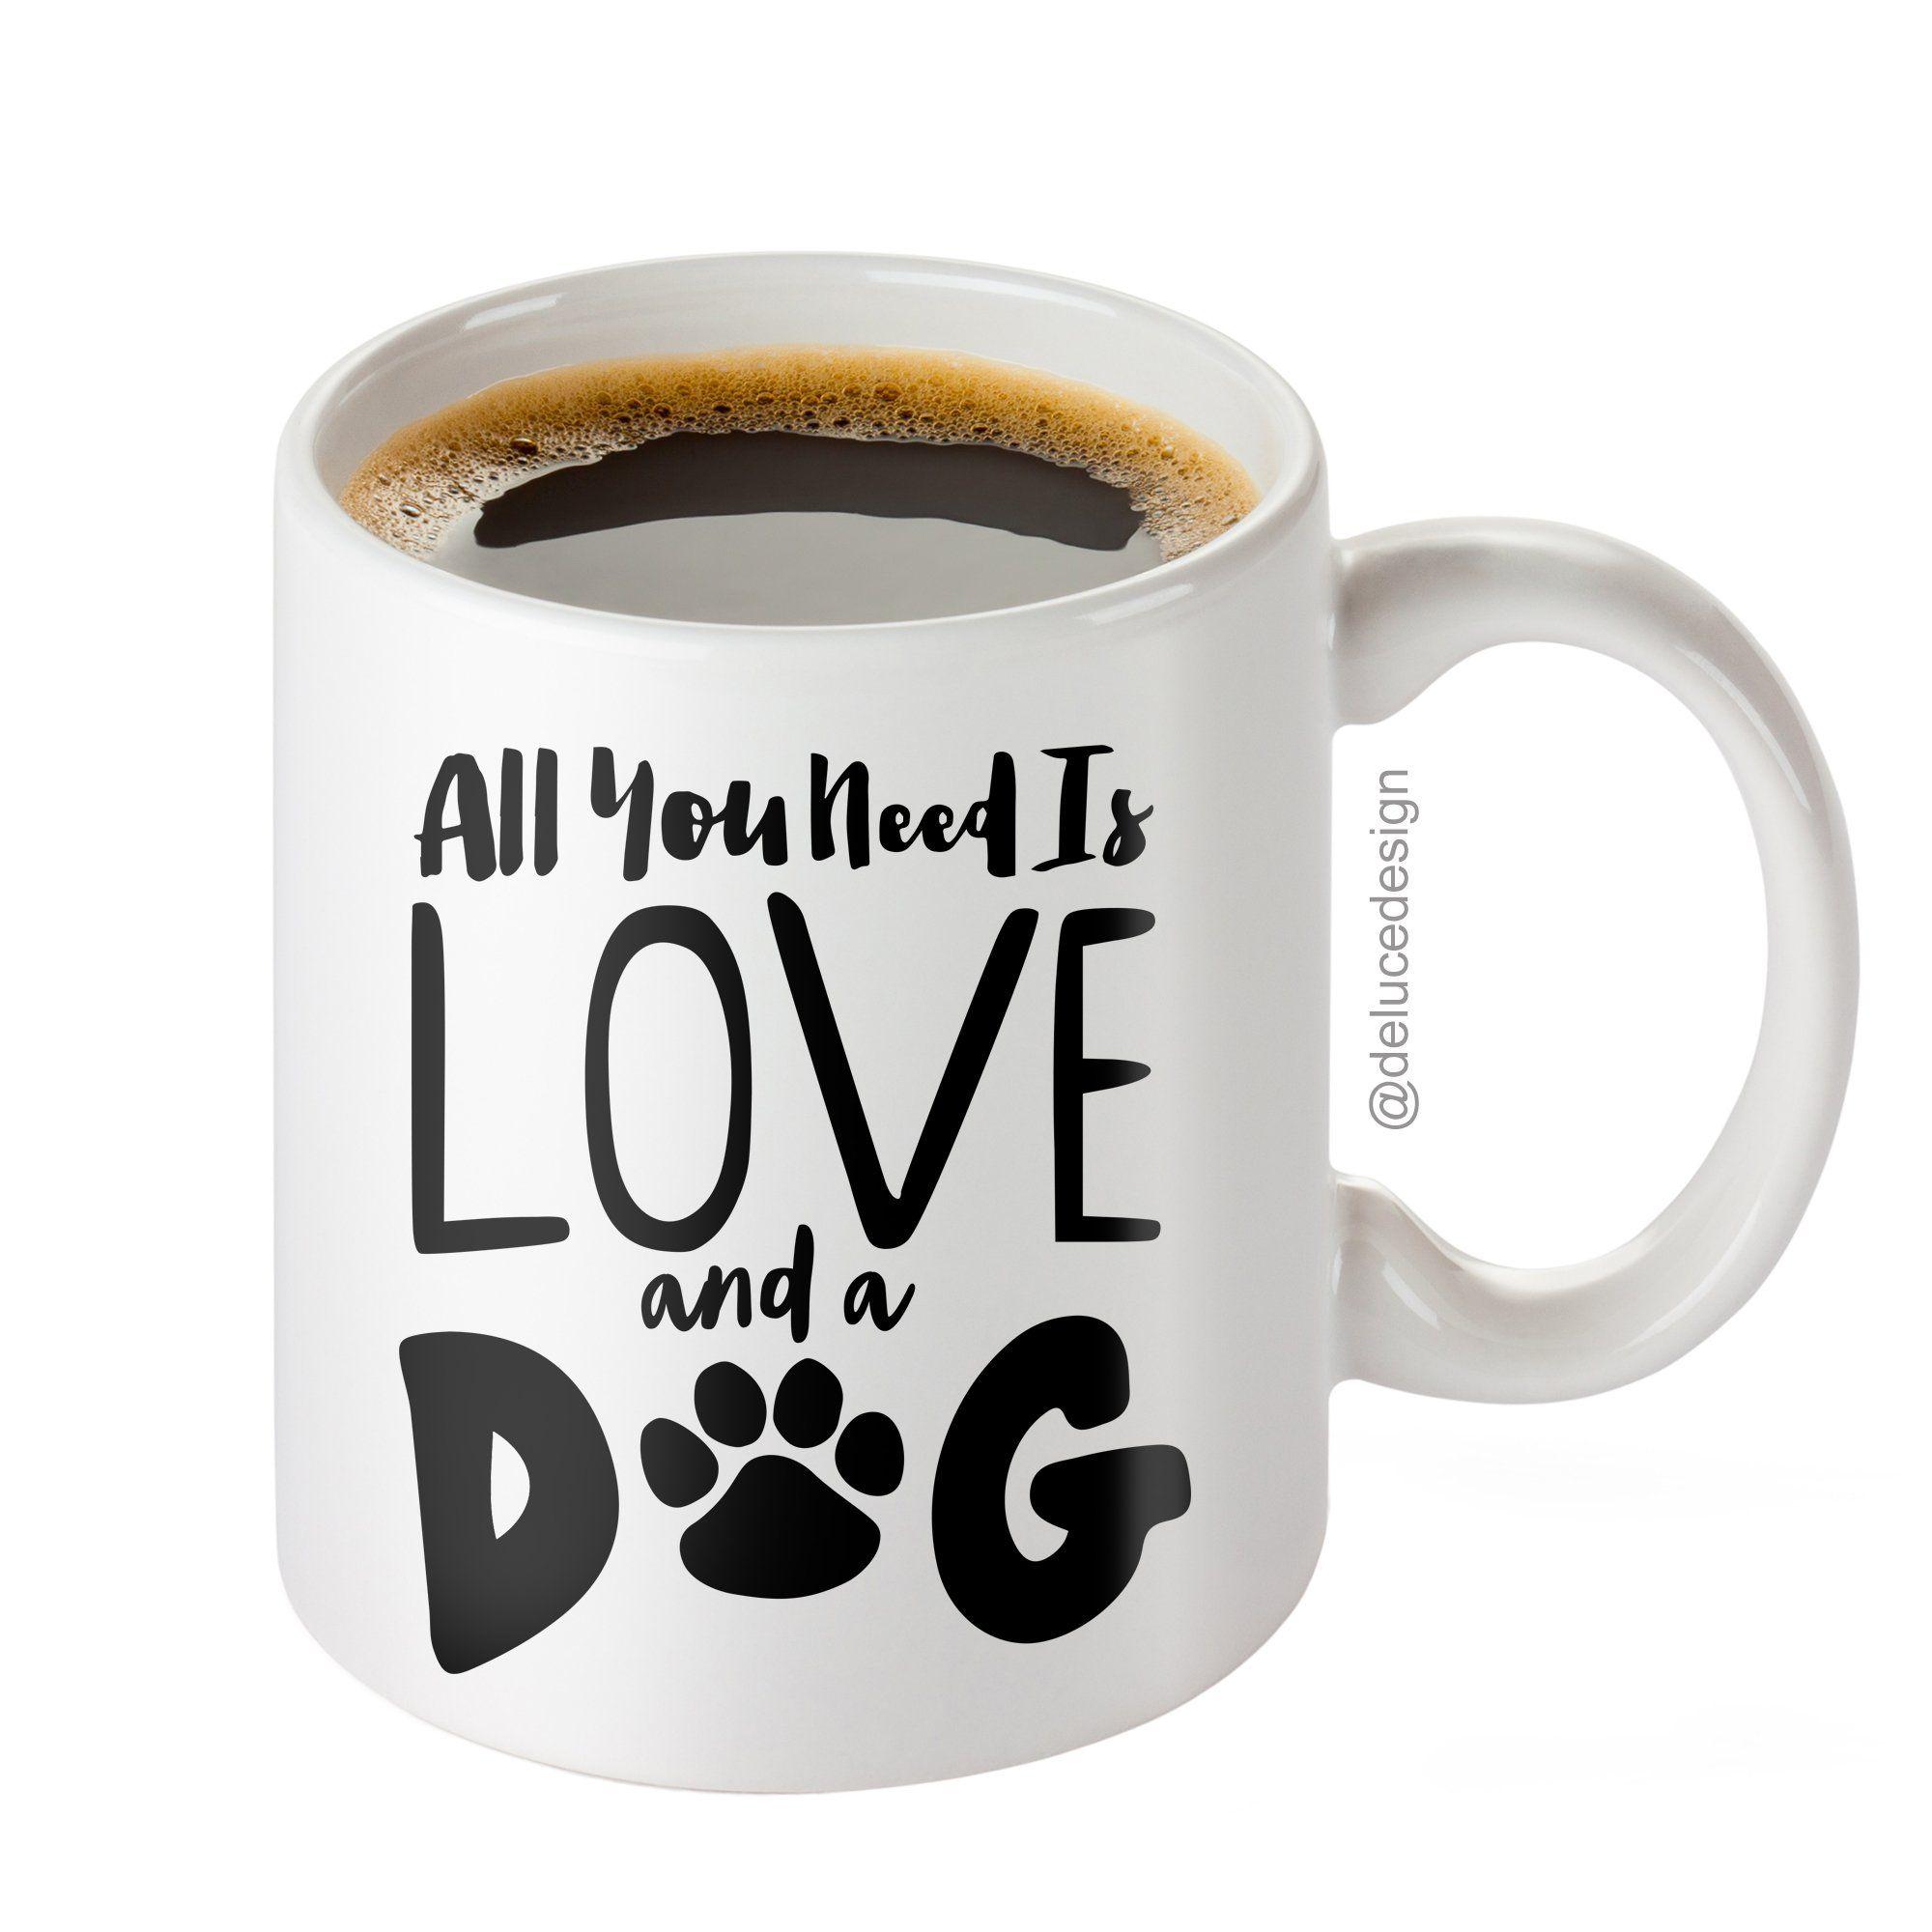 Dog Coffee Mug All You Need is Love and a Dog Coffee Mug